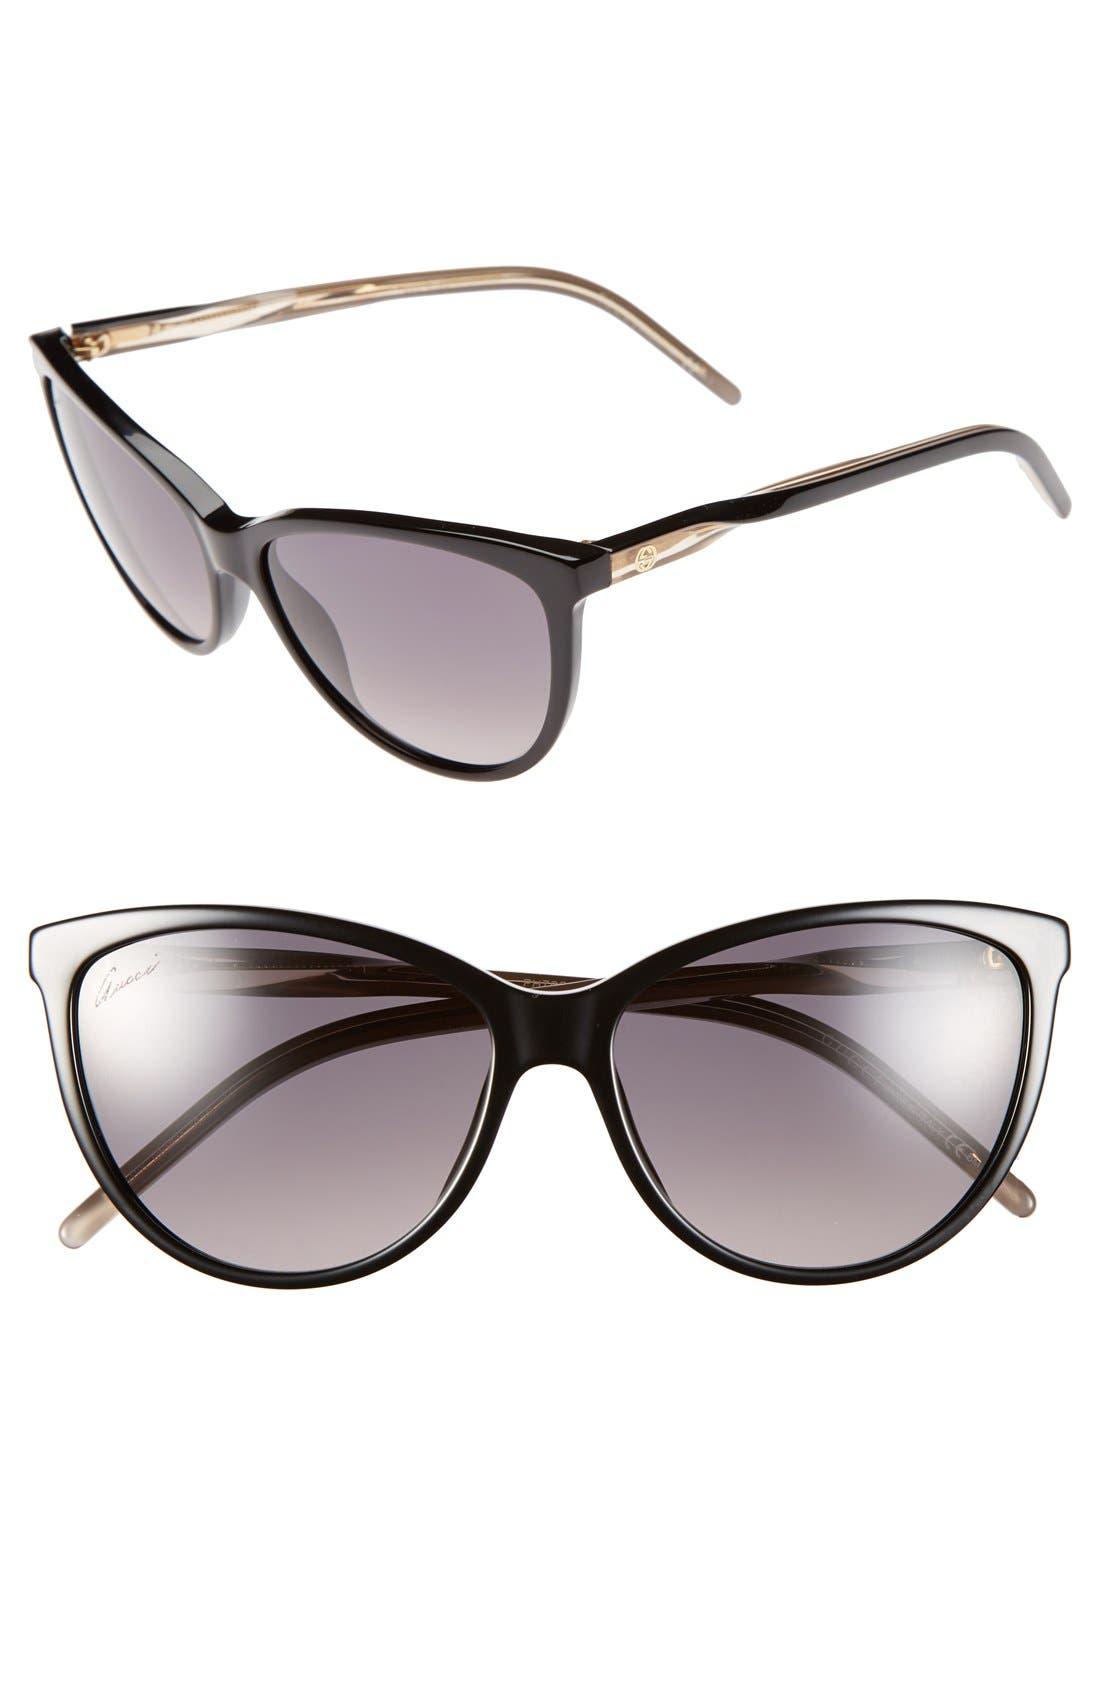 Alternate Image 1 Selected - Gucci 58mm Cat Eye Sunglasses